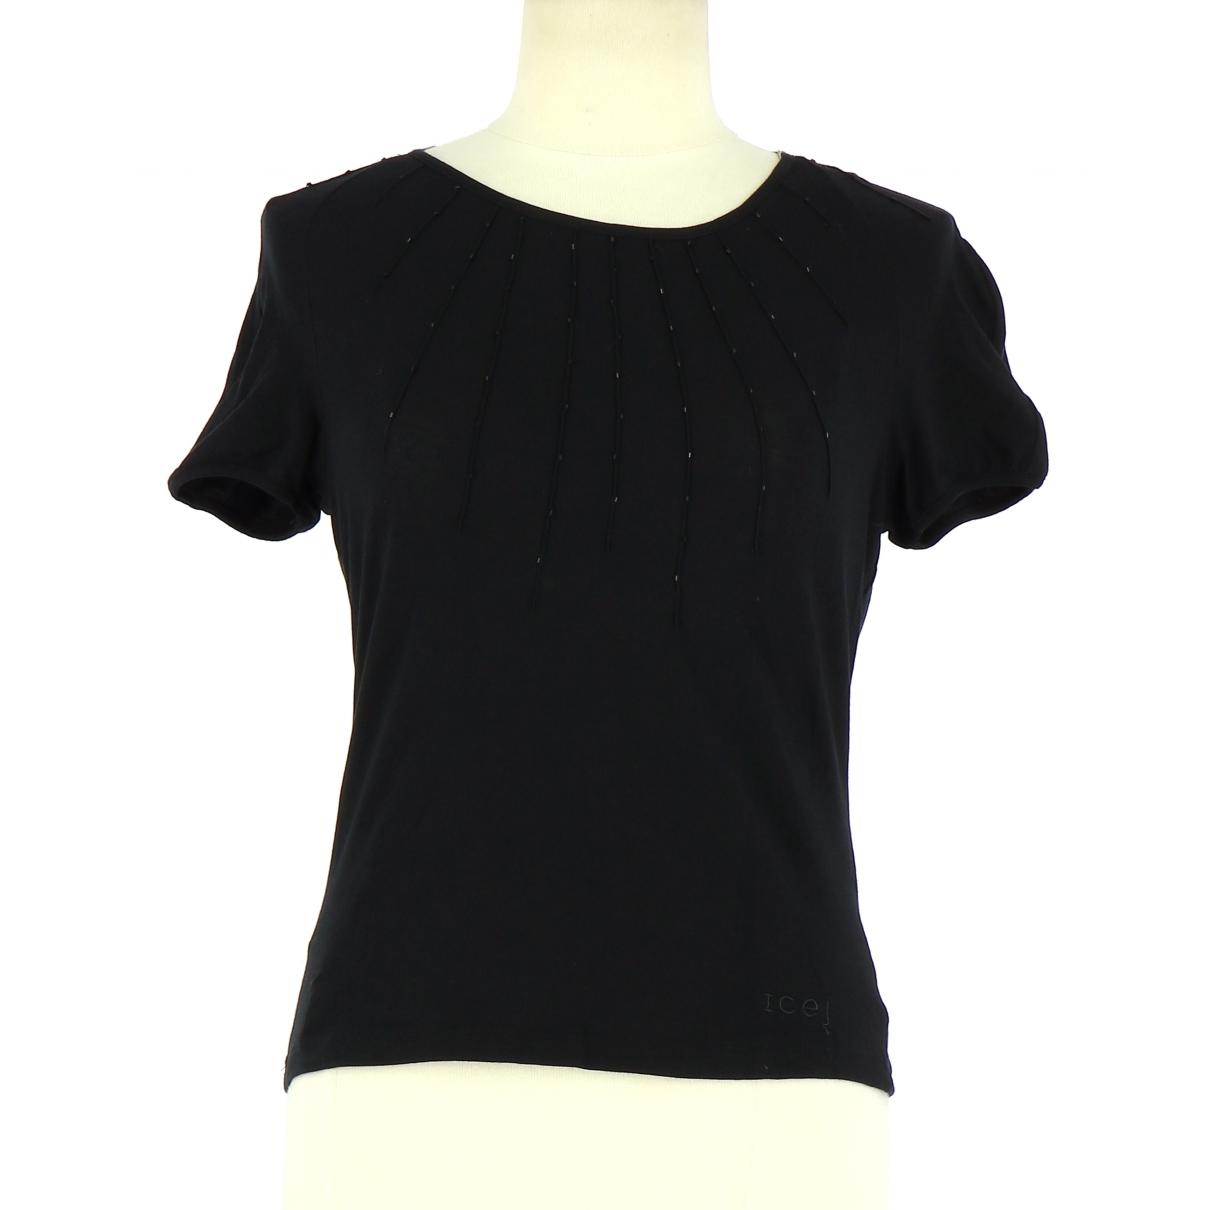 Iceberg - Top   pour femme en coton - noir